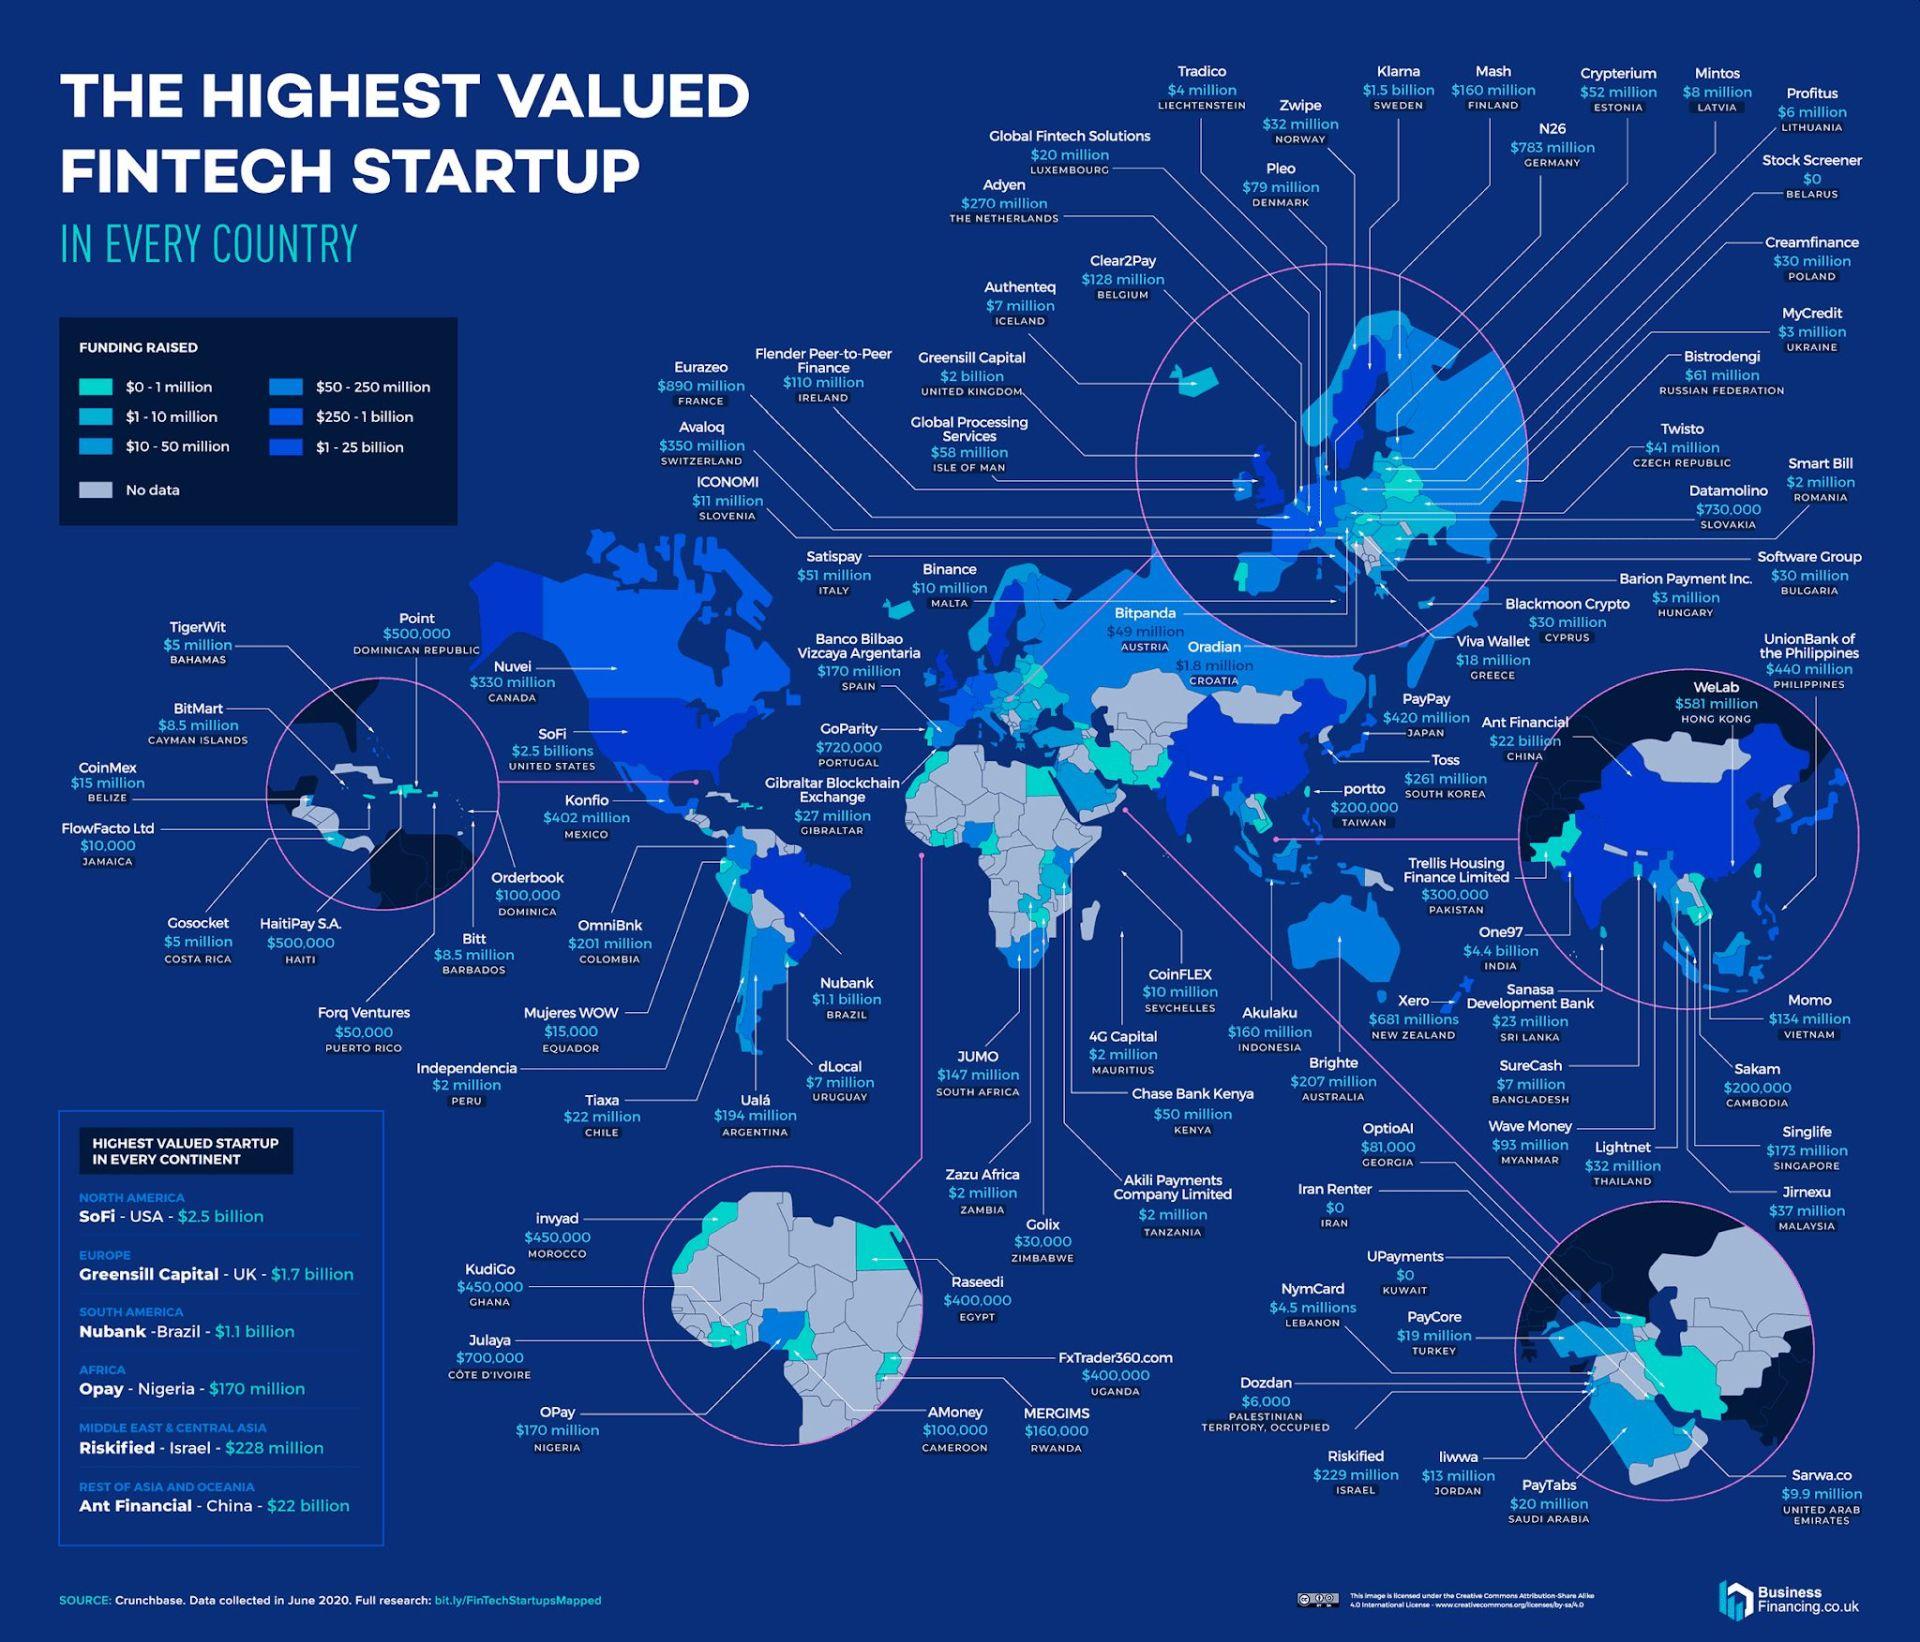 Highest value fintech startups globally June 2020 - Where are the Biggest Fintech Startup Hotspots Around the World?